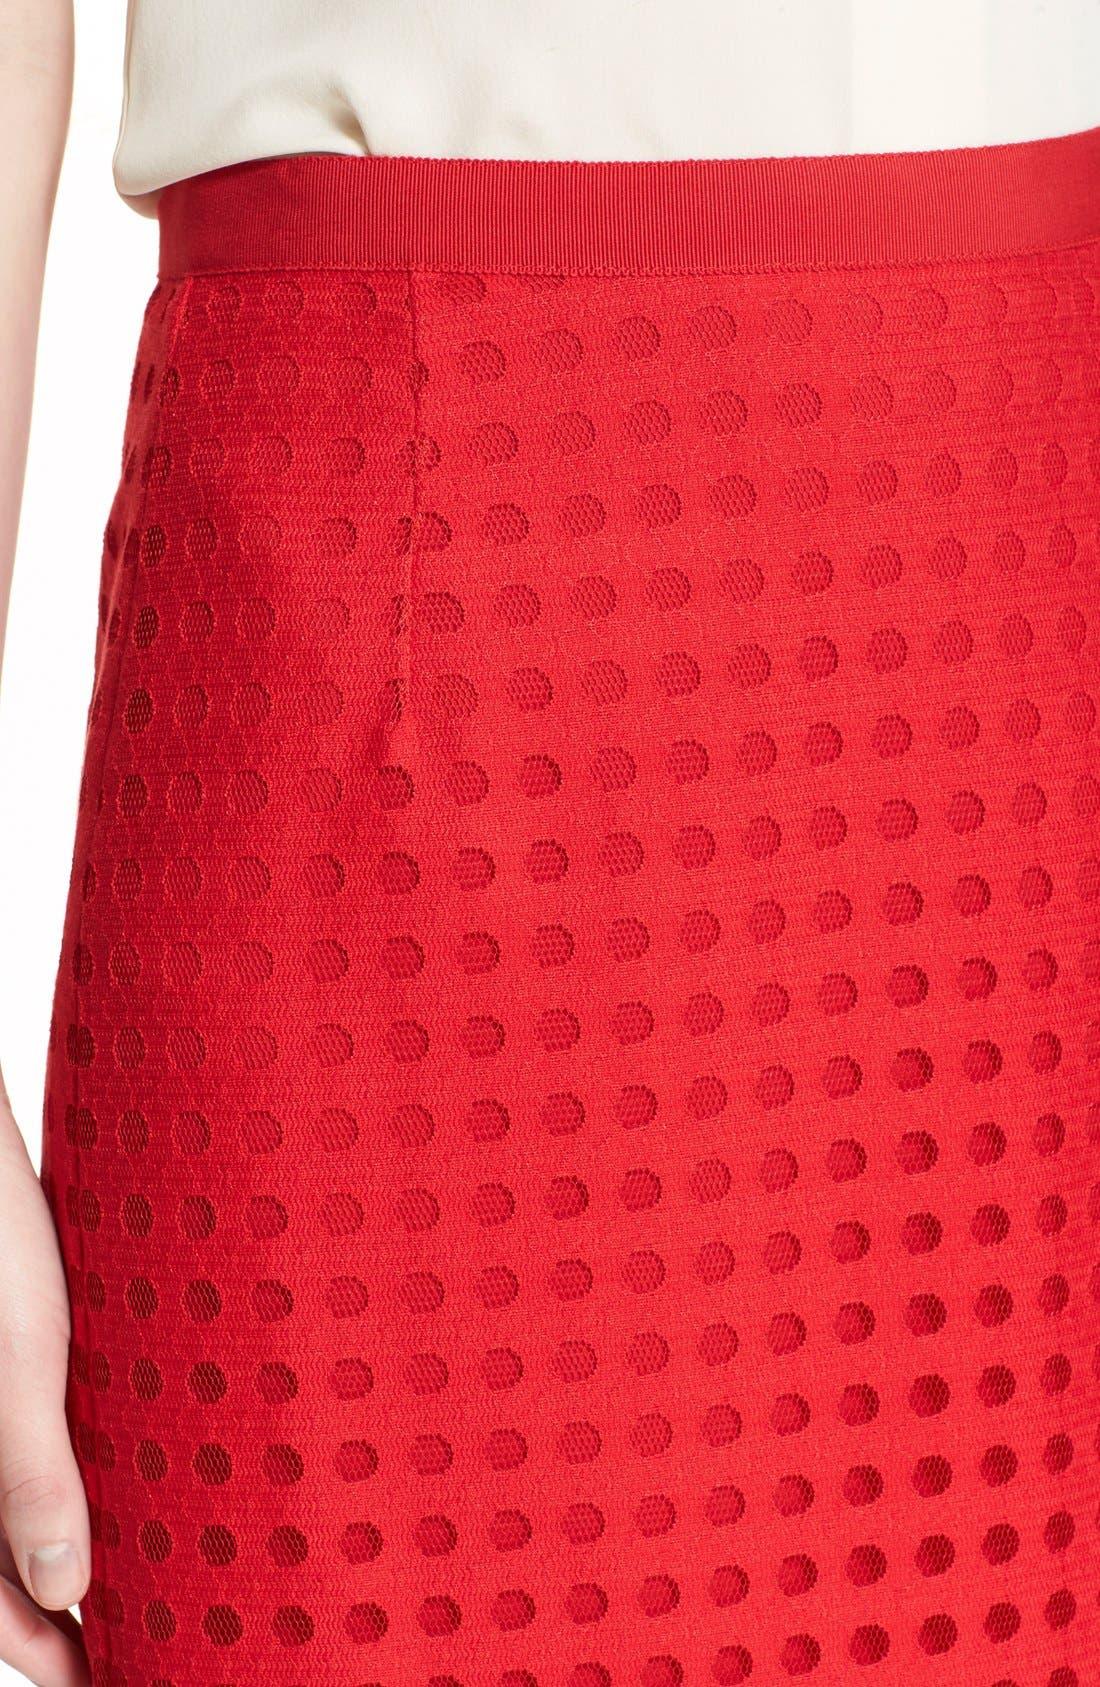 Mesh Pencil Skirt,                             Alternate thumbnail 2, color,                             600